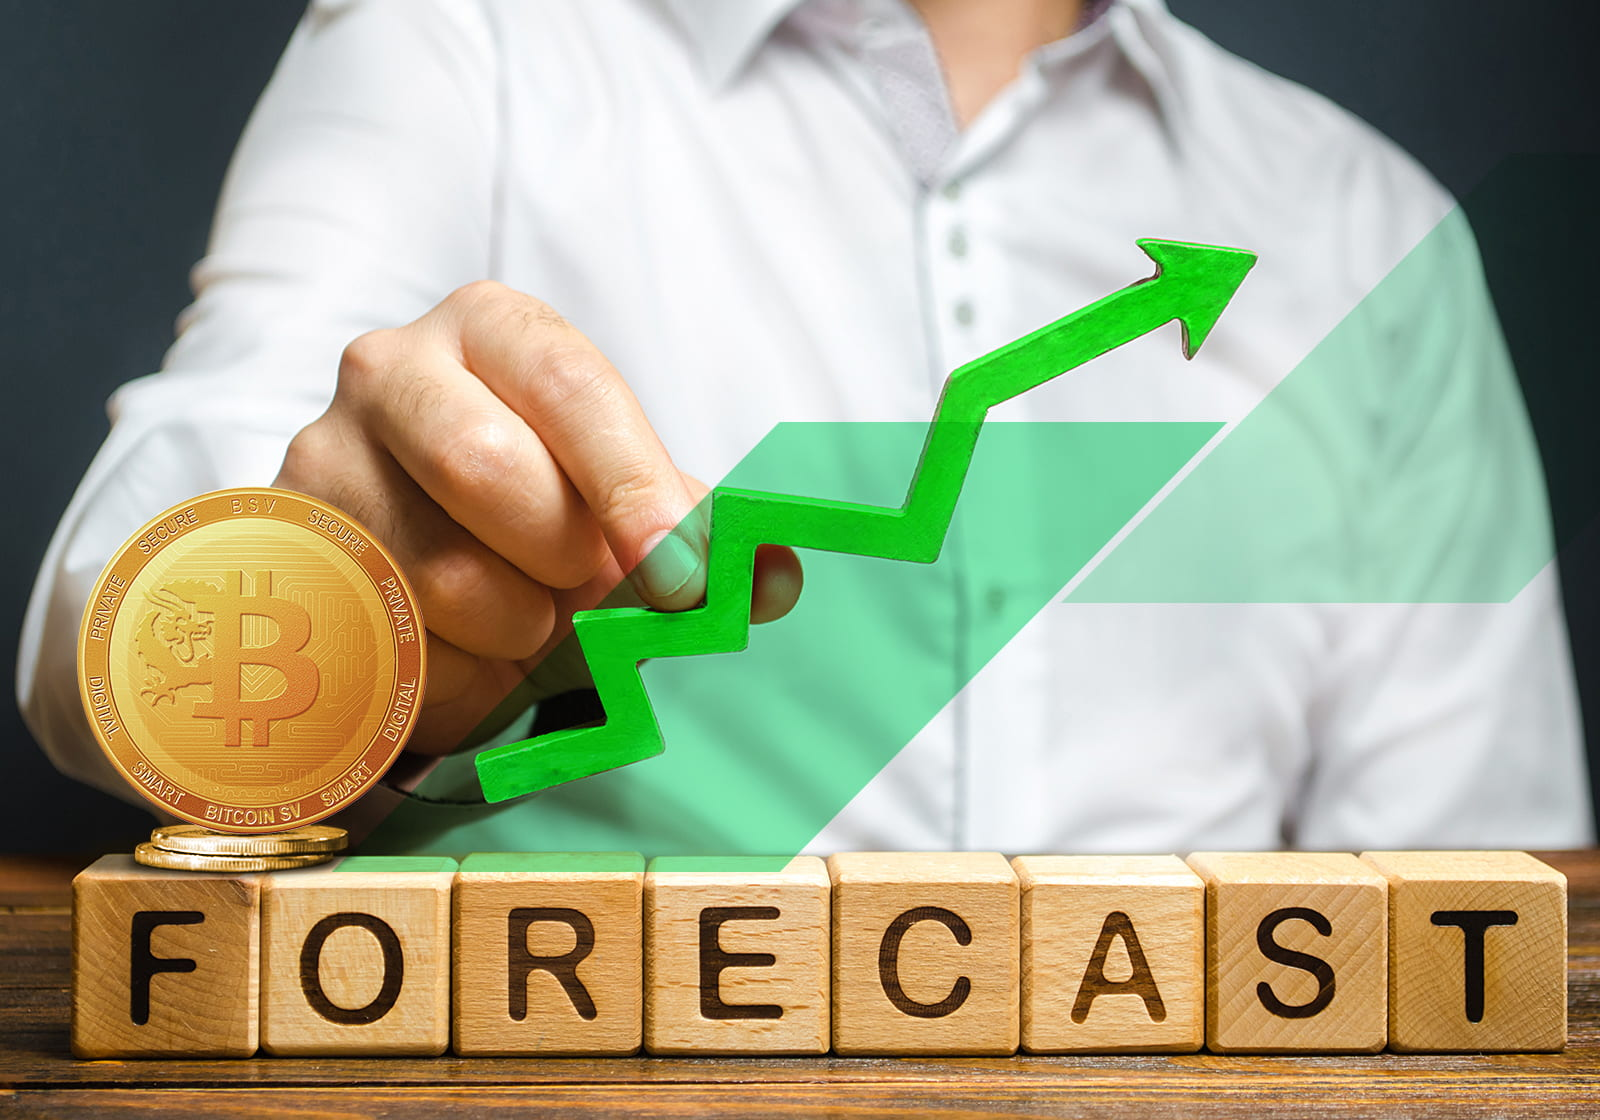 Bitcoin SV (BSV) Price Prediction for 2020 - 2030 | StormGain